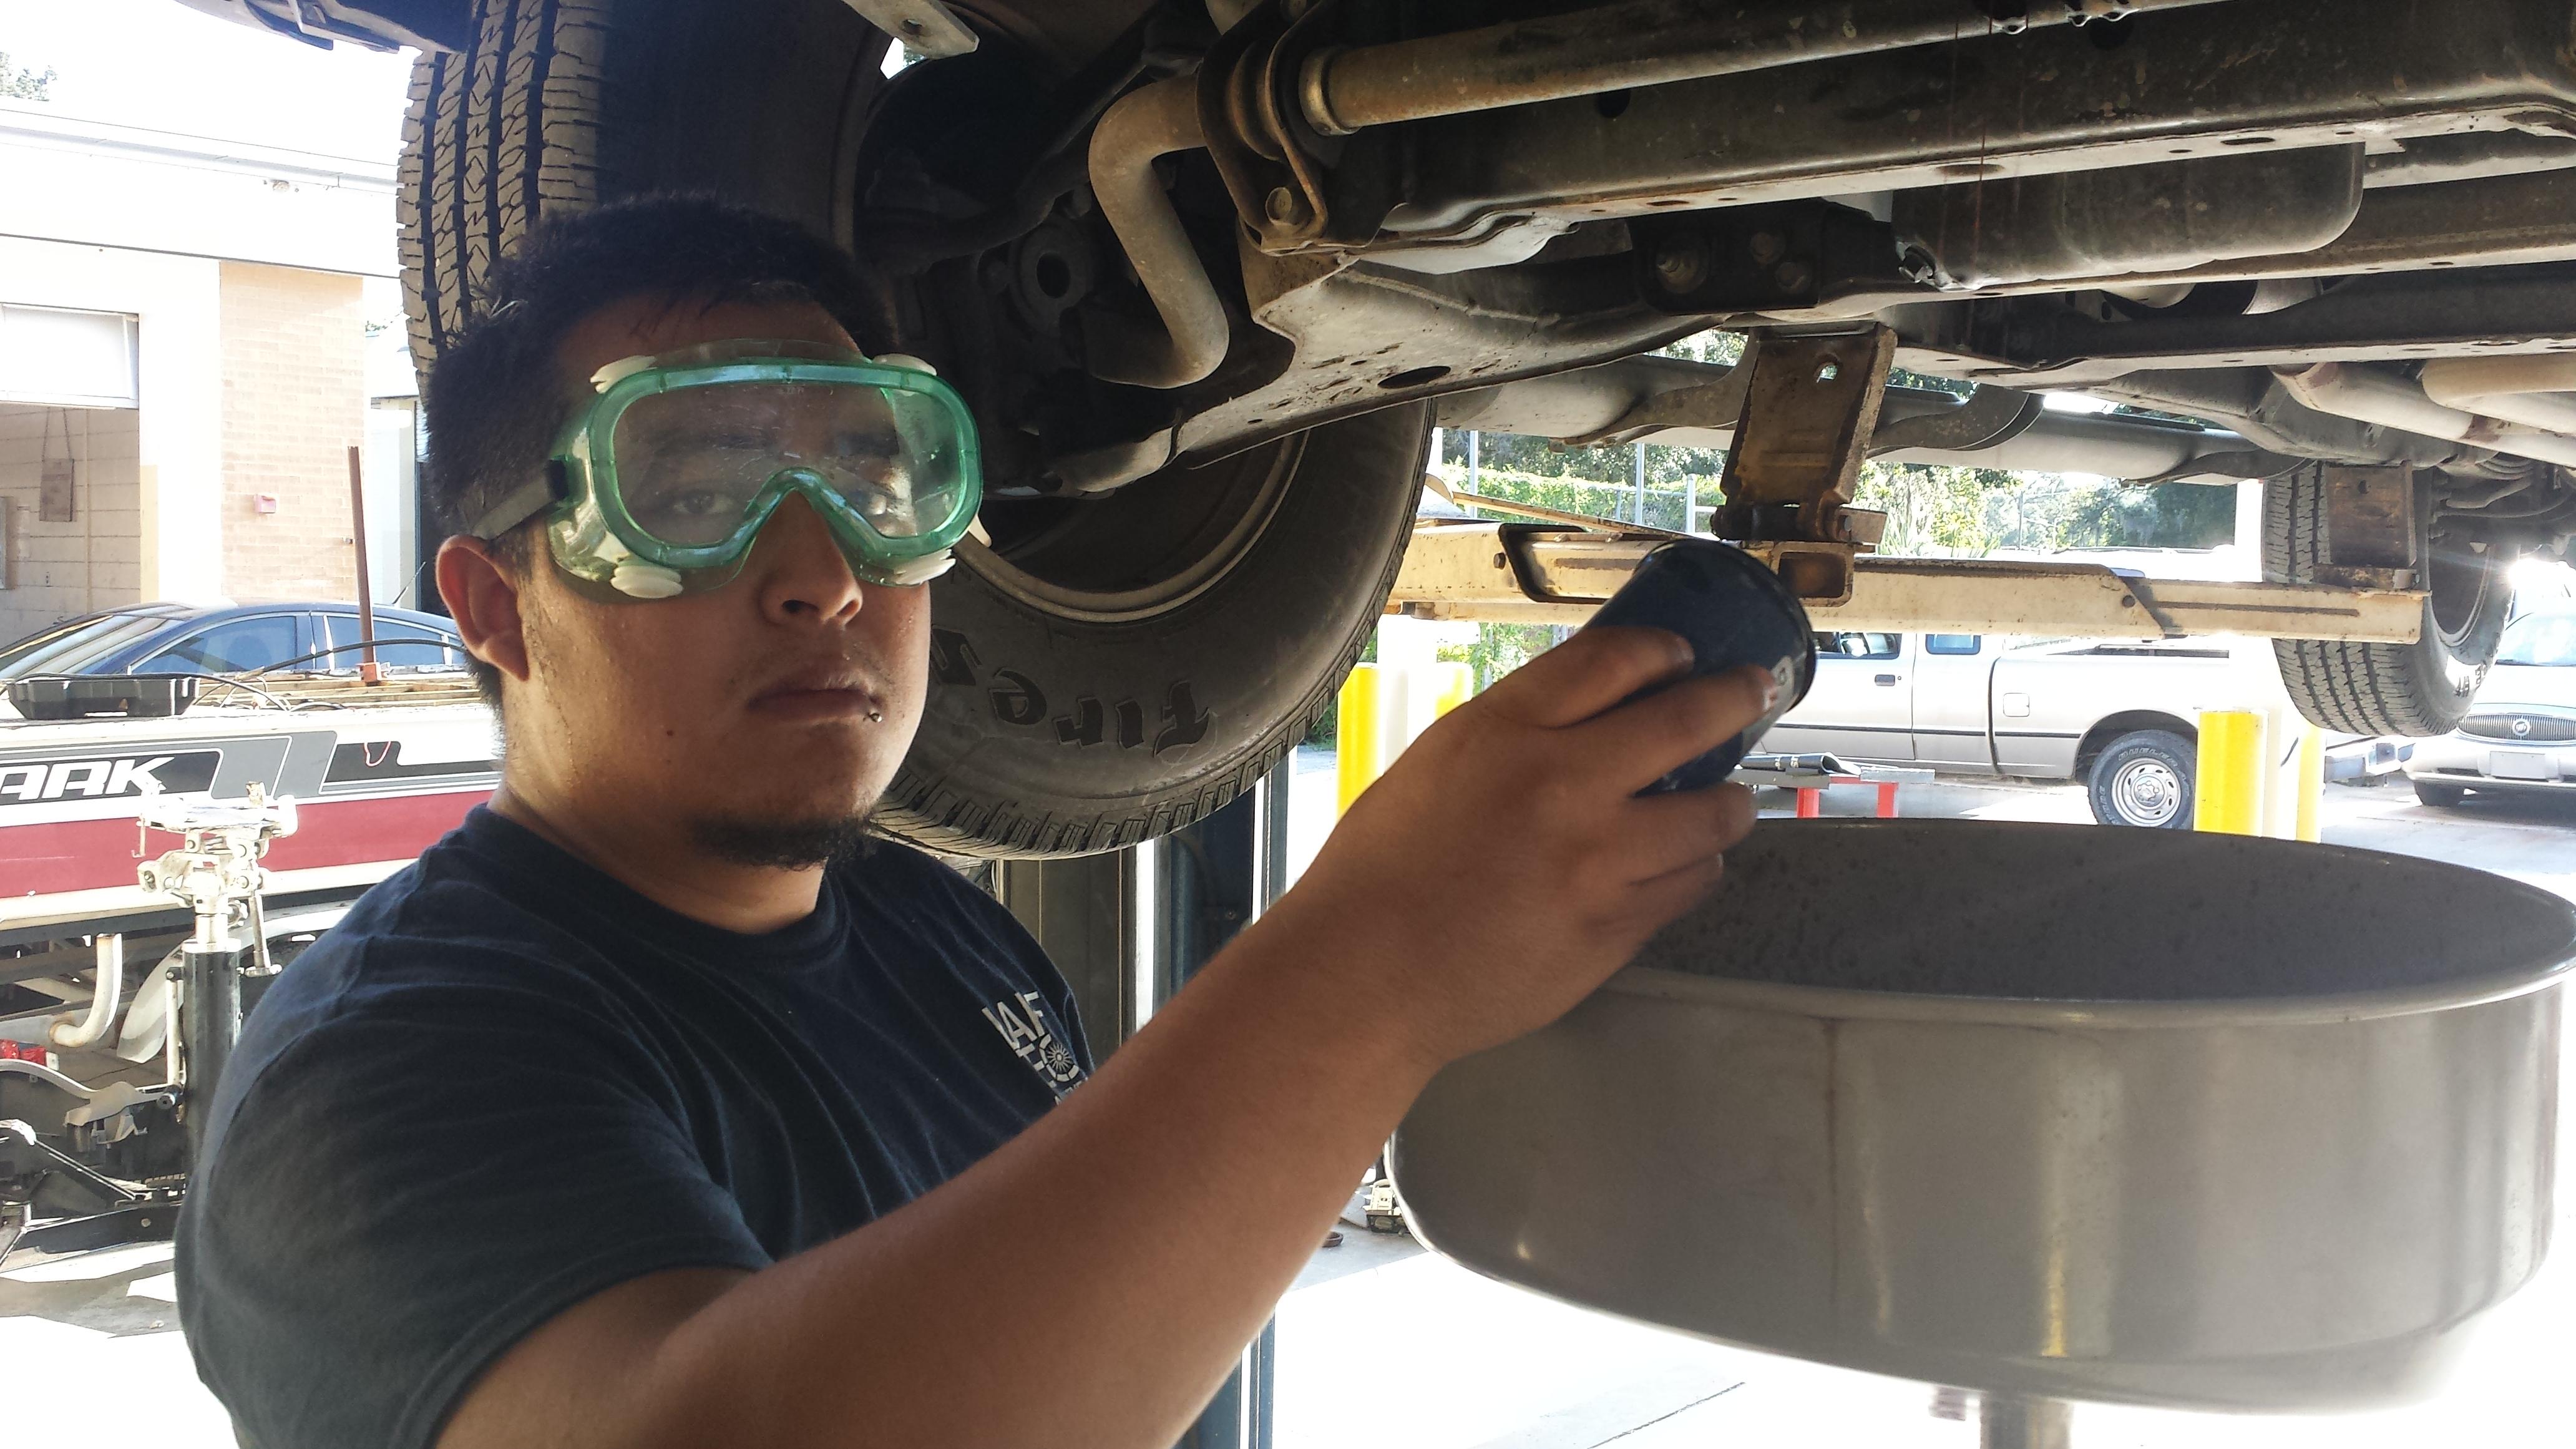 20140829 083803 friday update lube tech job description - Lube Technician Job Description